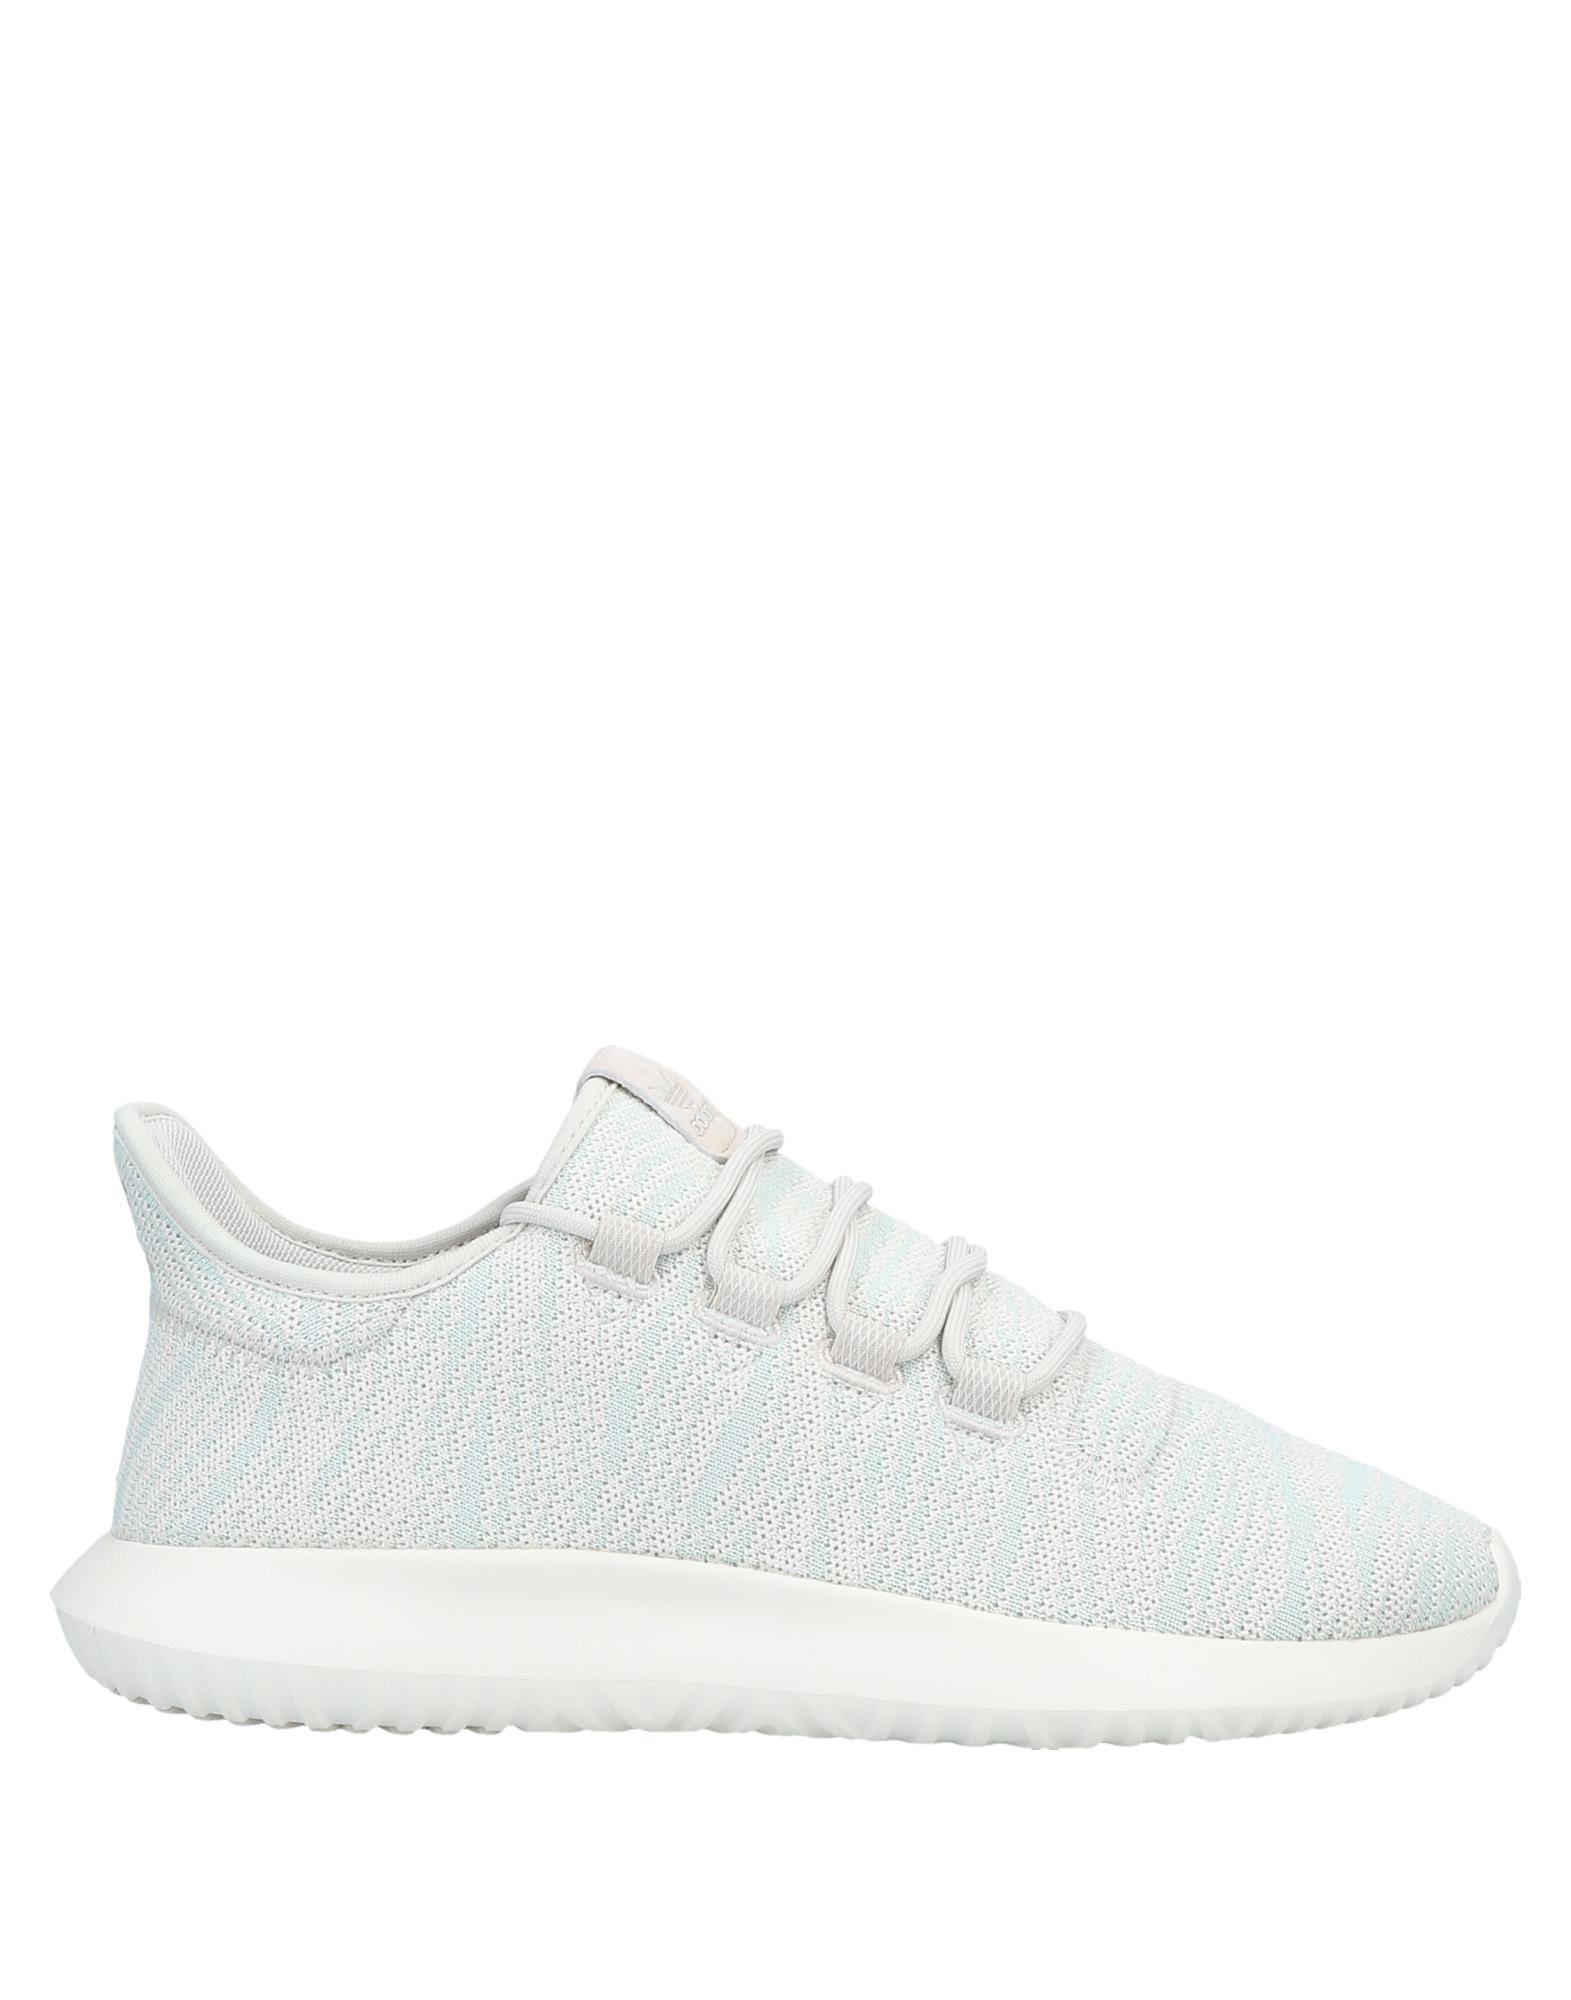 Adidas Originals Sneakers - Women Adidas Originals Sneakers - online on  Australia - Sneakers 11563447EL 01f339